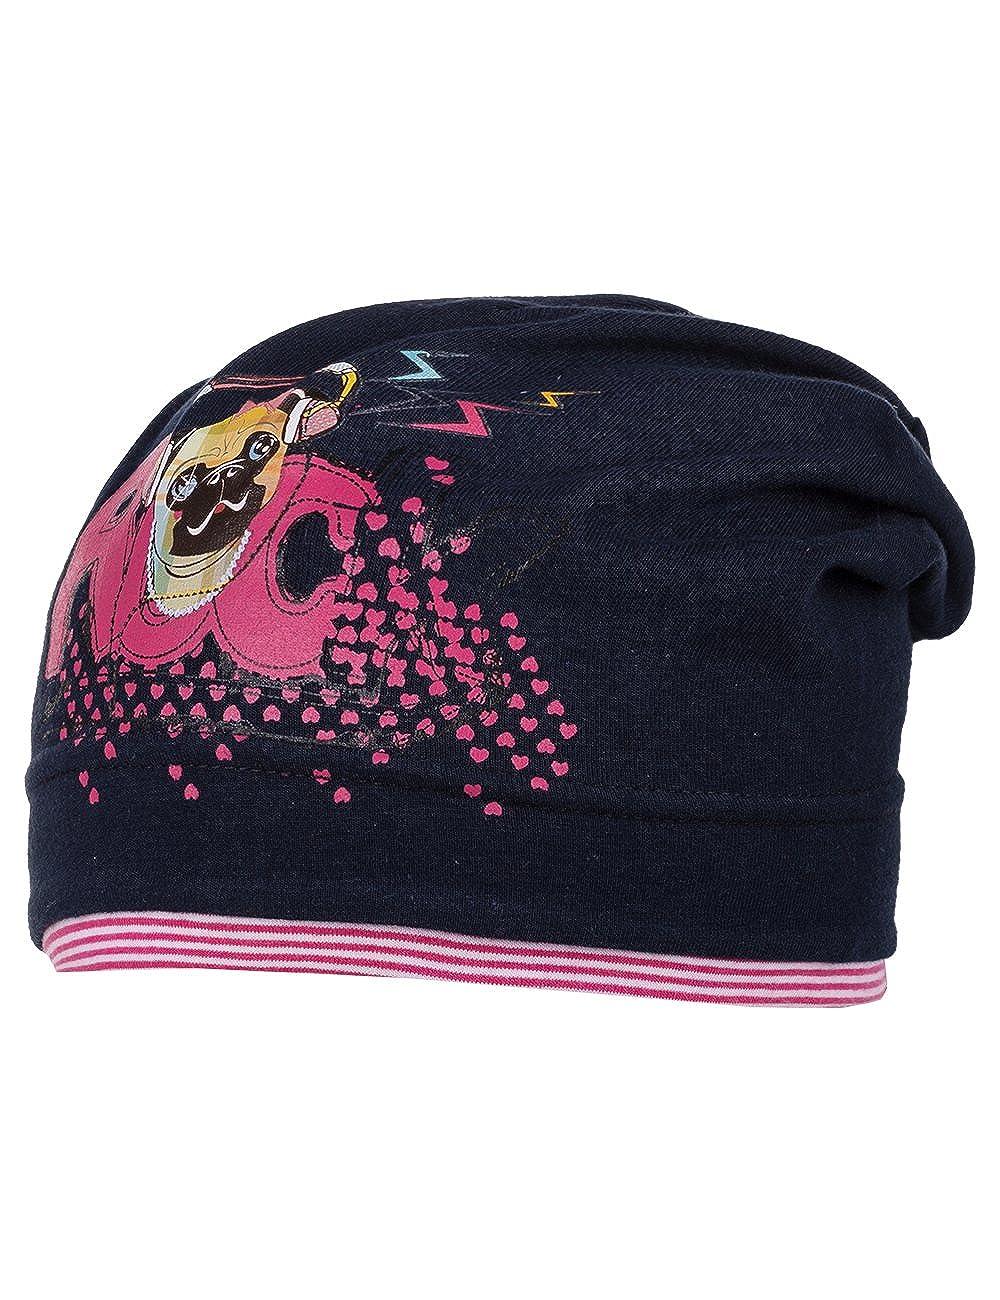 MaxiMo Kids Girl - Beanie Short Mops, Cappellopello Bambina 63503-750300